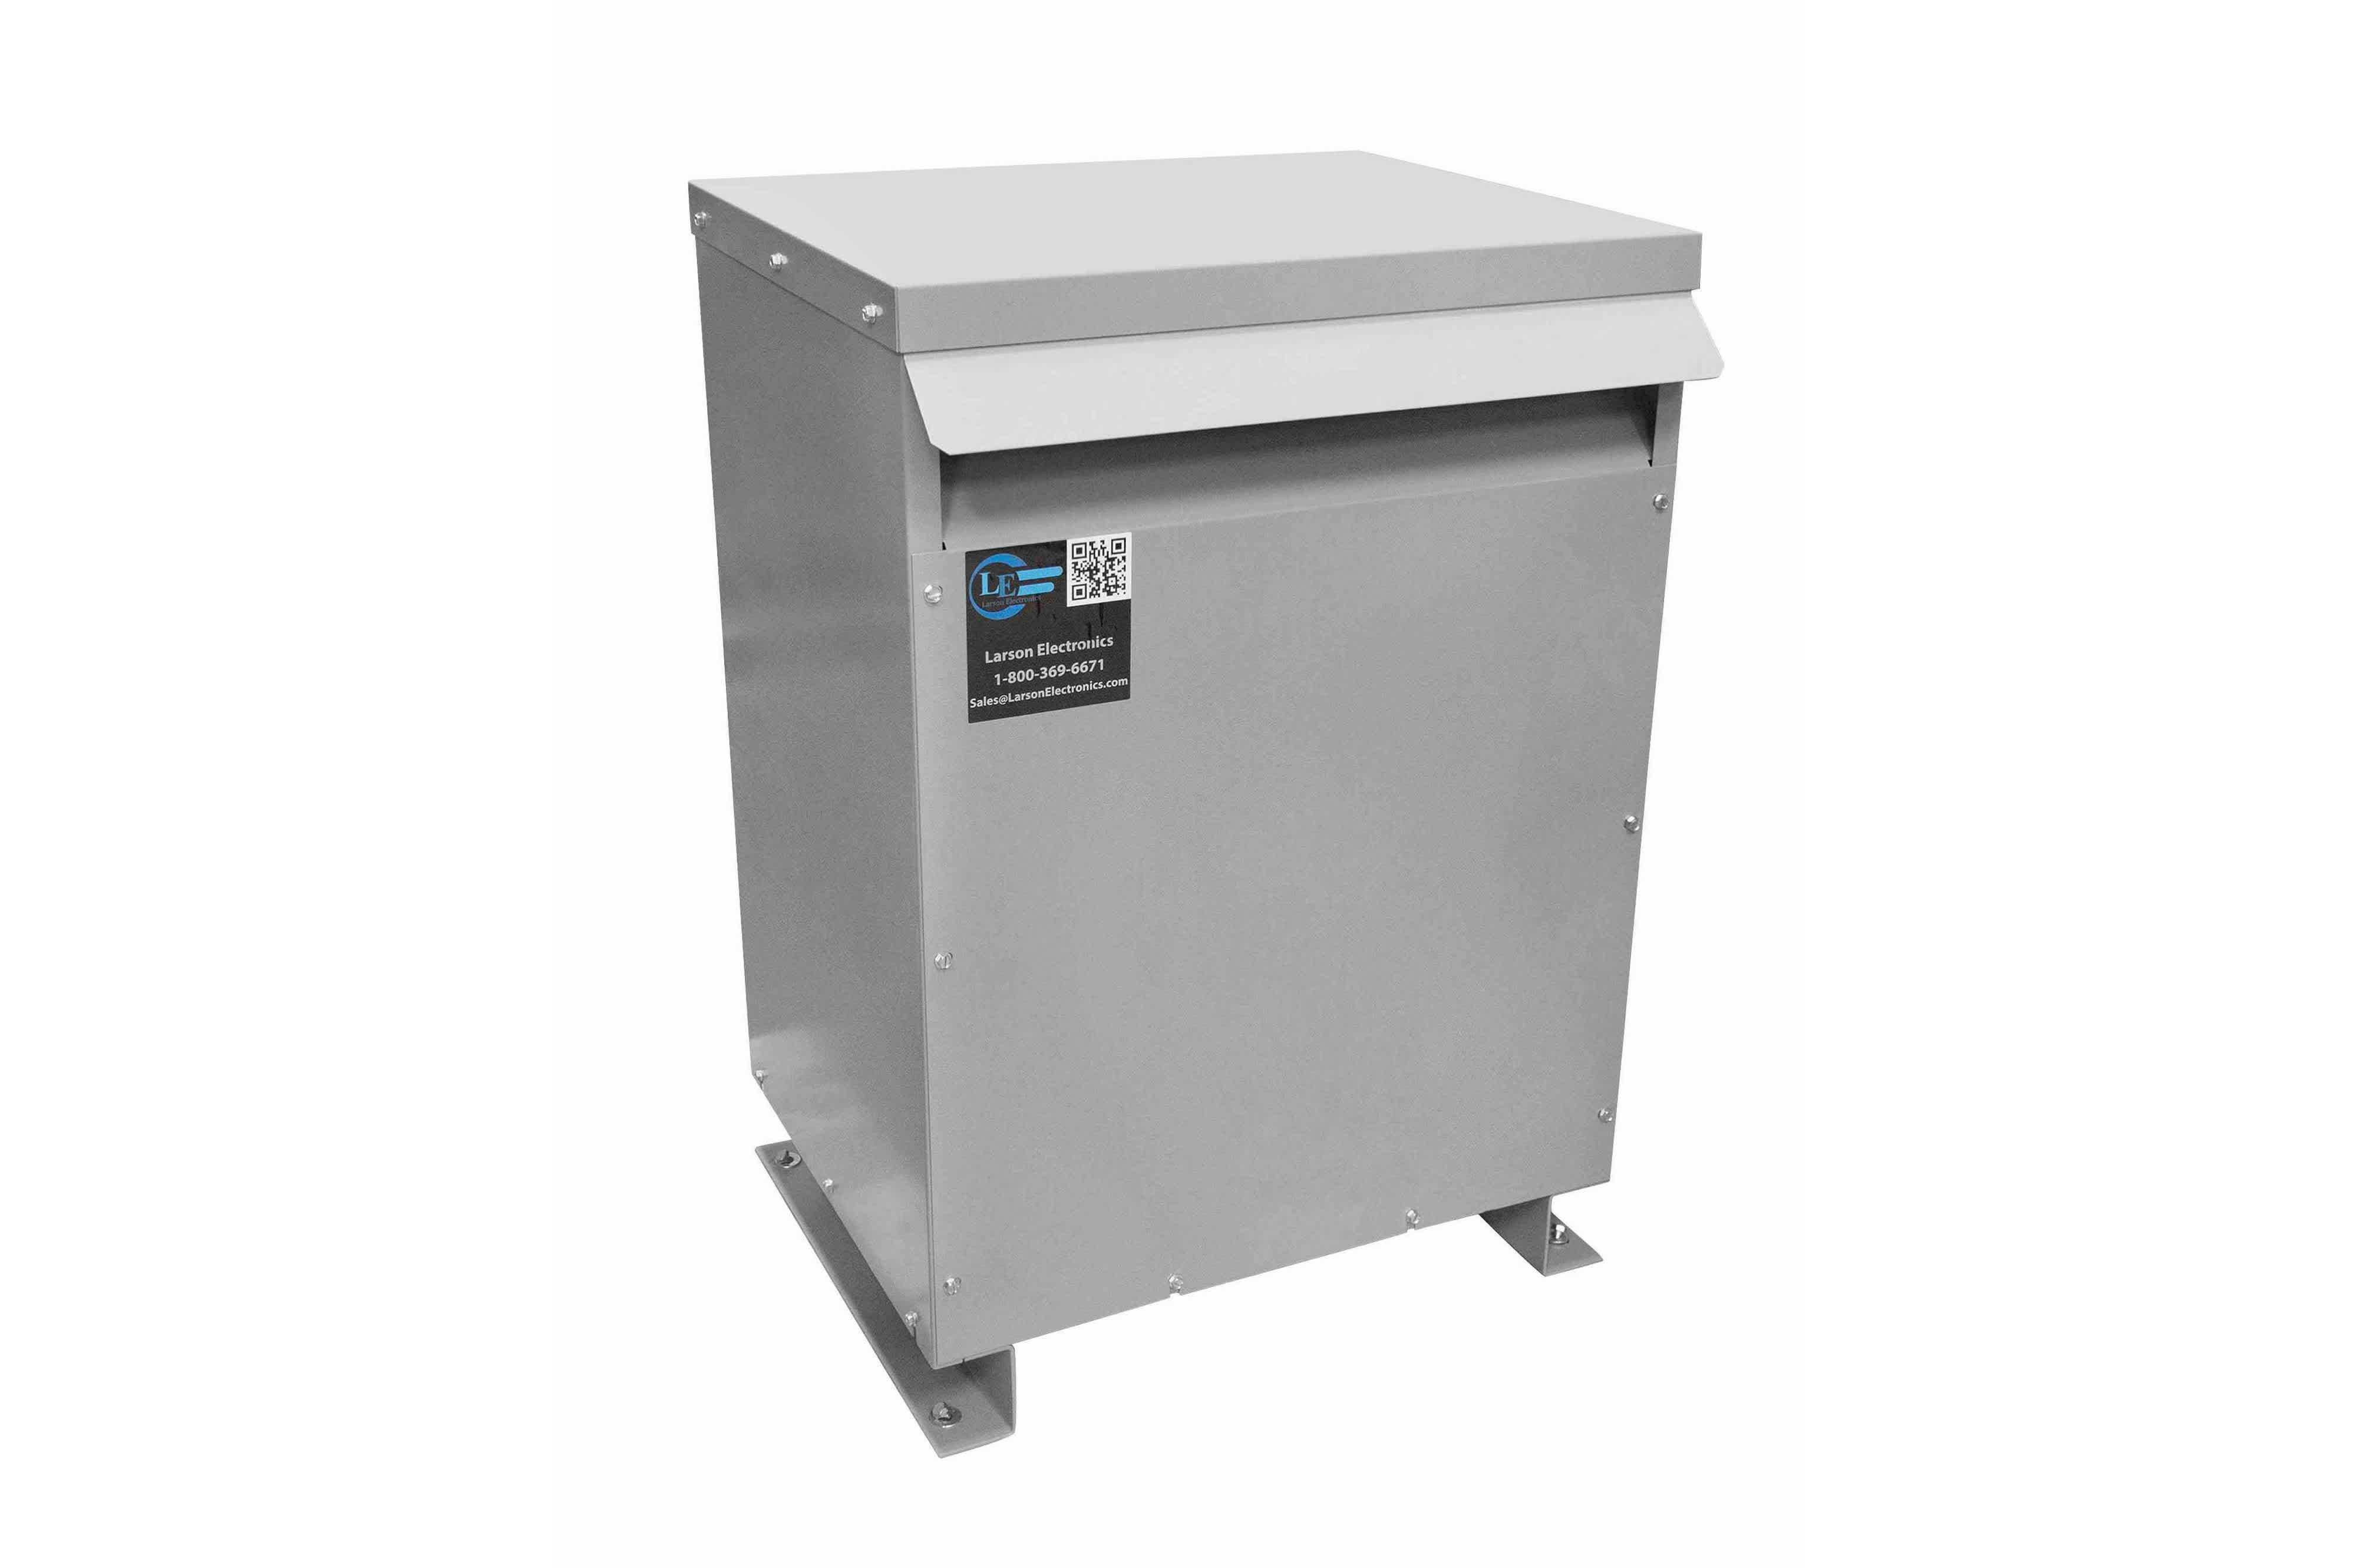 500 kVA 3PH Isolation Transformer, 575V Wye Primary, 400V Delta Secondary, N3R, Ventilated, 60 Hz